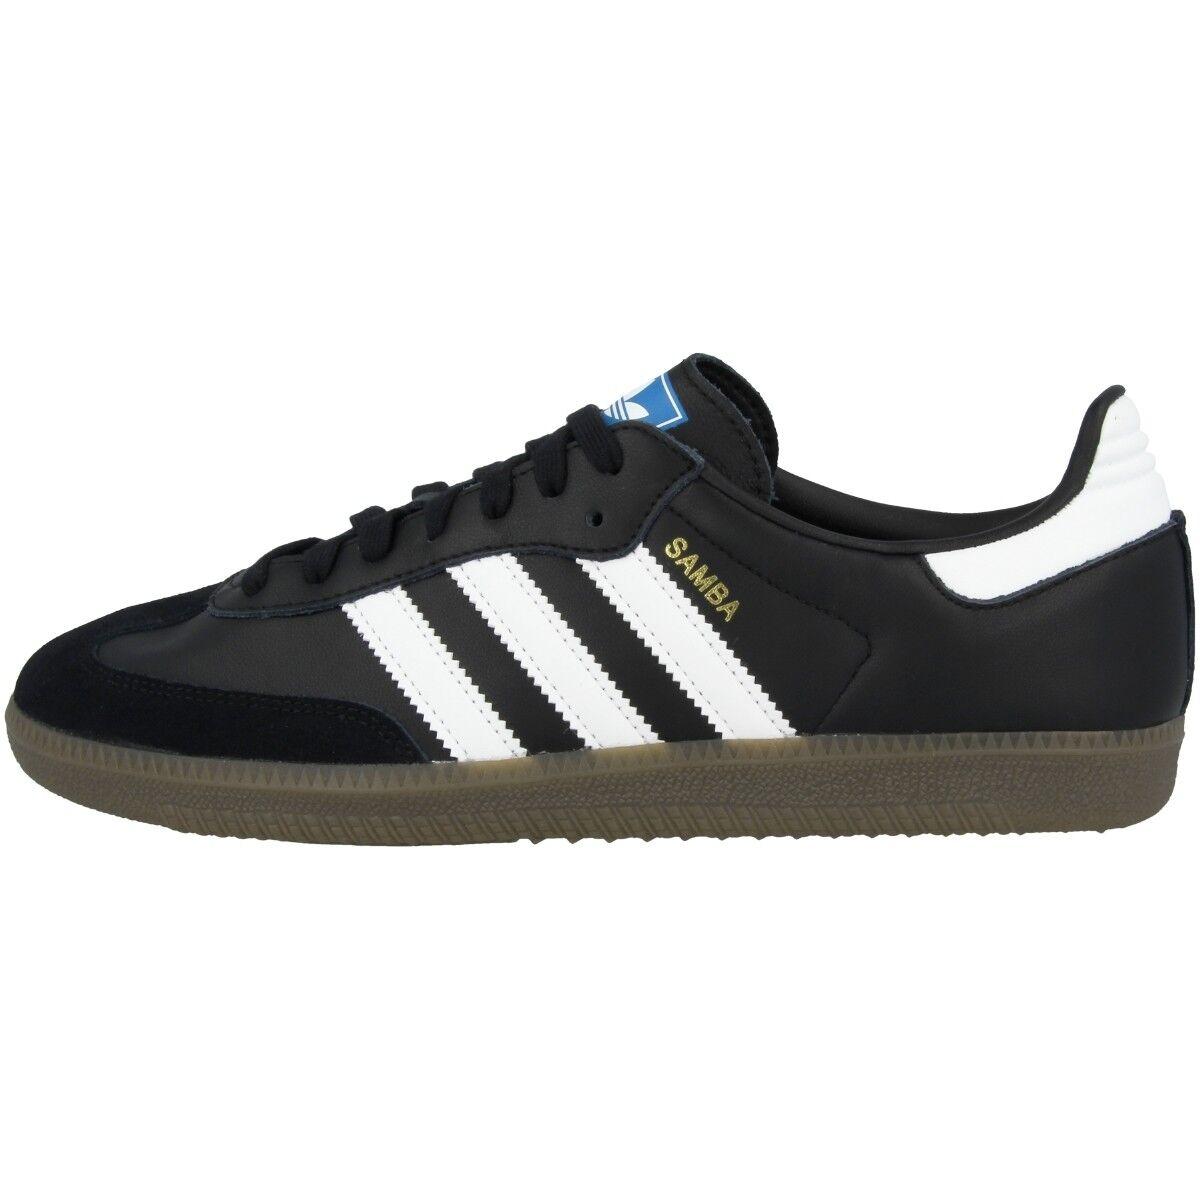 Adidas Samba Og Original Chaussures Original Og Baskets Sport Loisir  Baskets Noir B75807 7a595c 9e1651087319